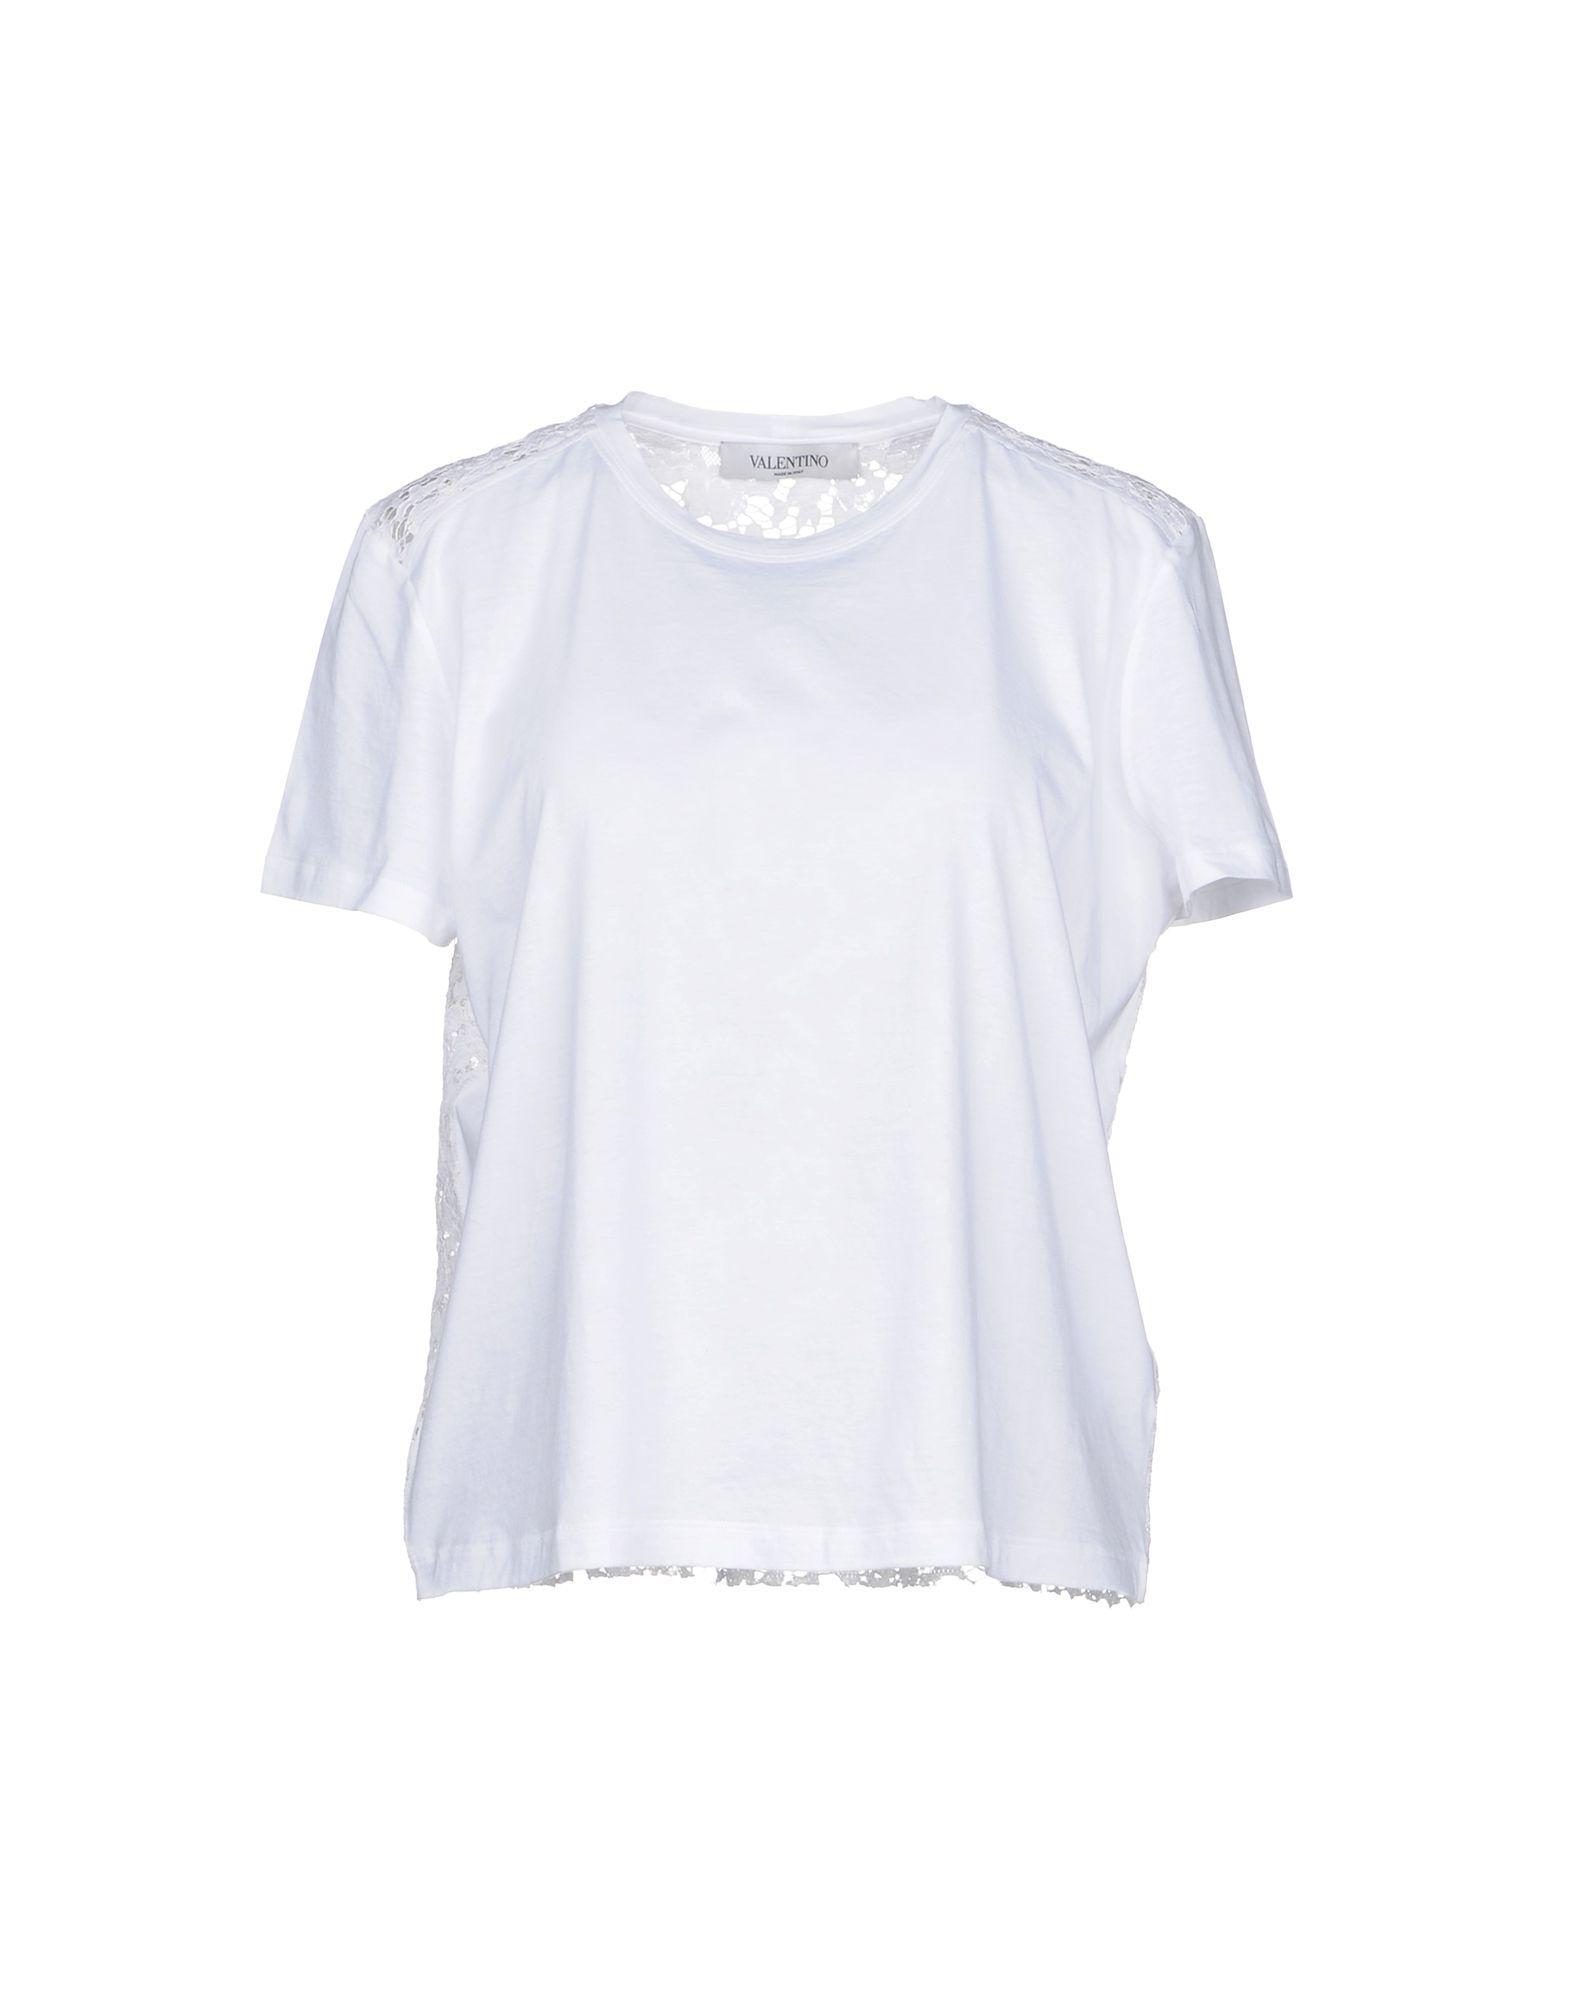 Valentino Blouse In White